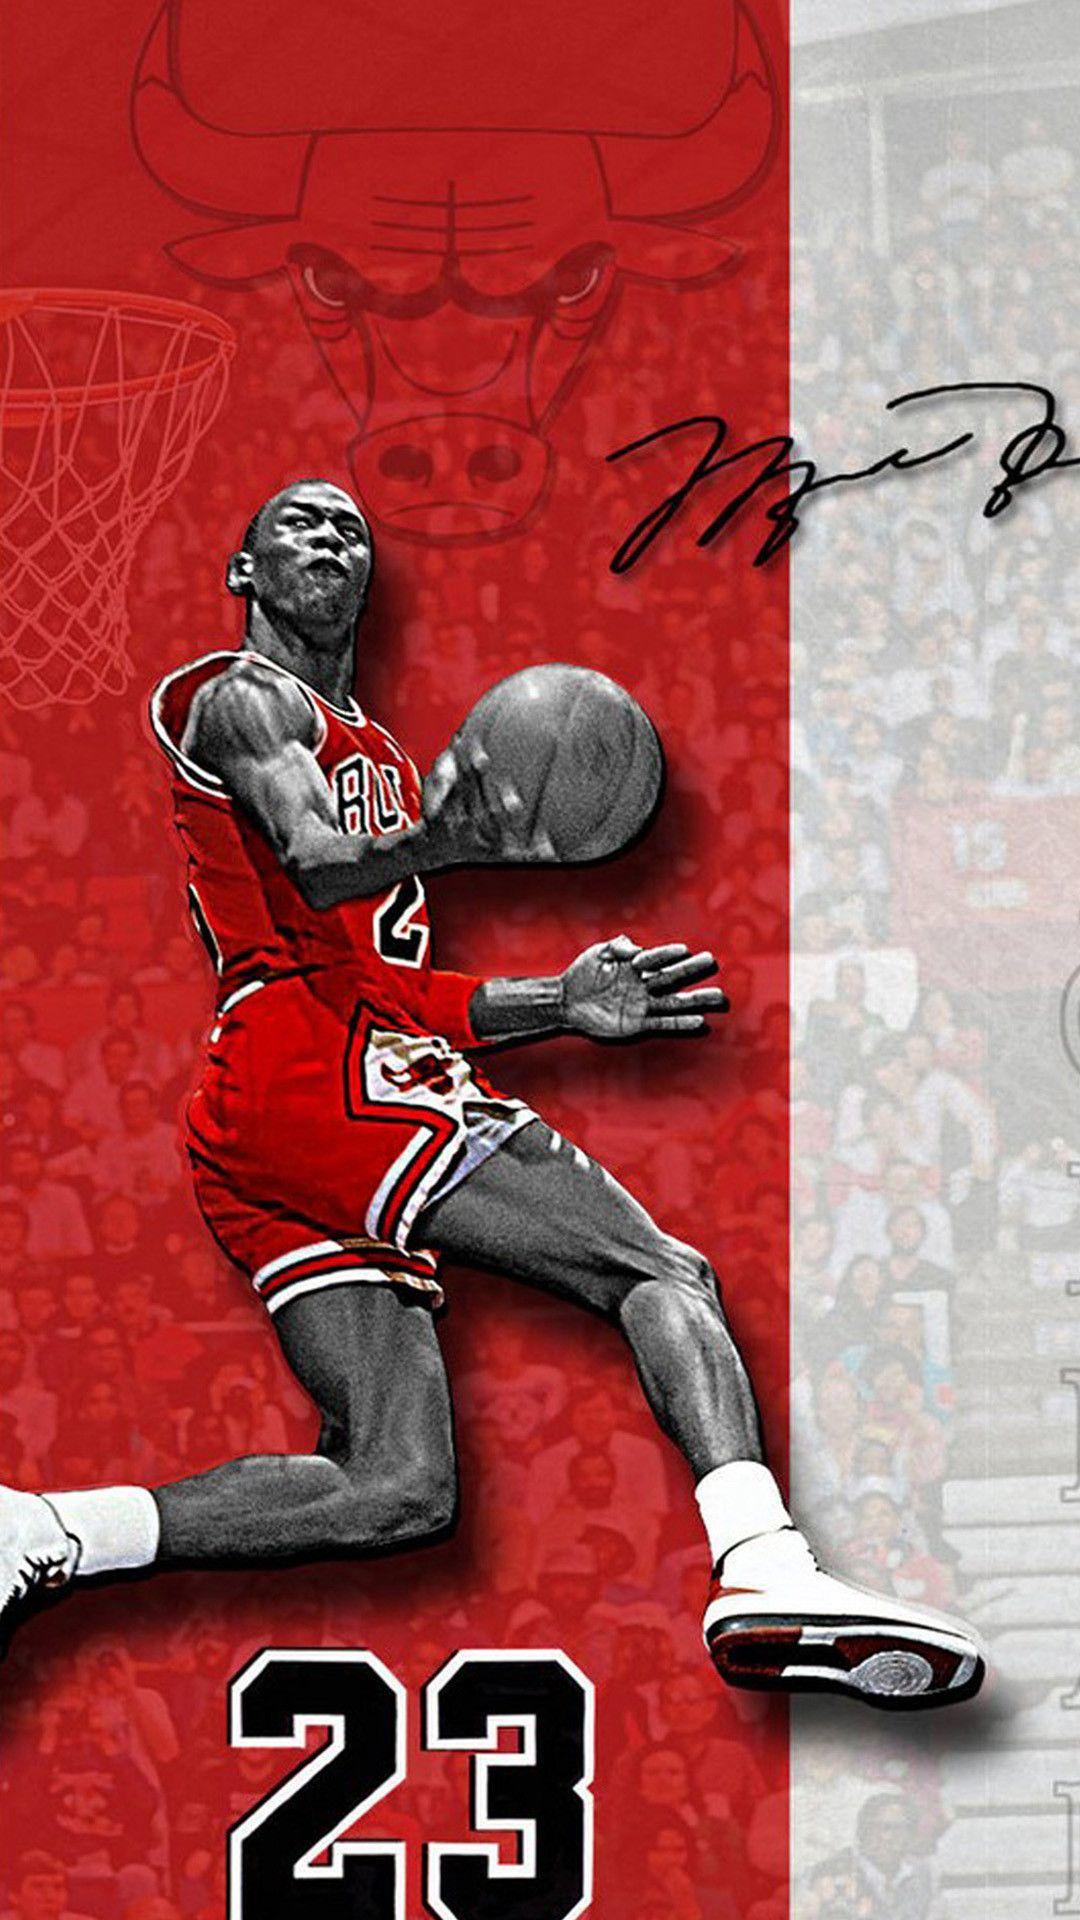 Jordan Background Hd Wallpaper » Hupages » Download Iphone